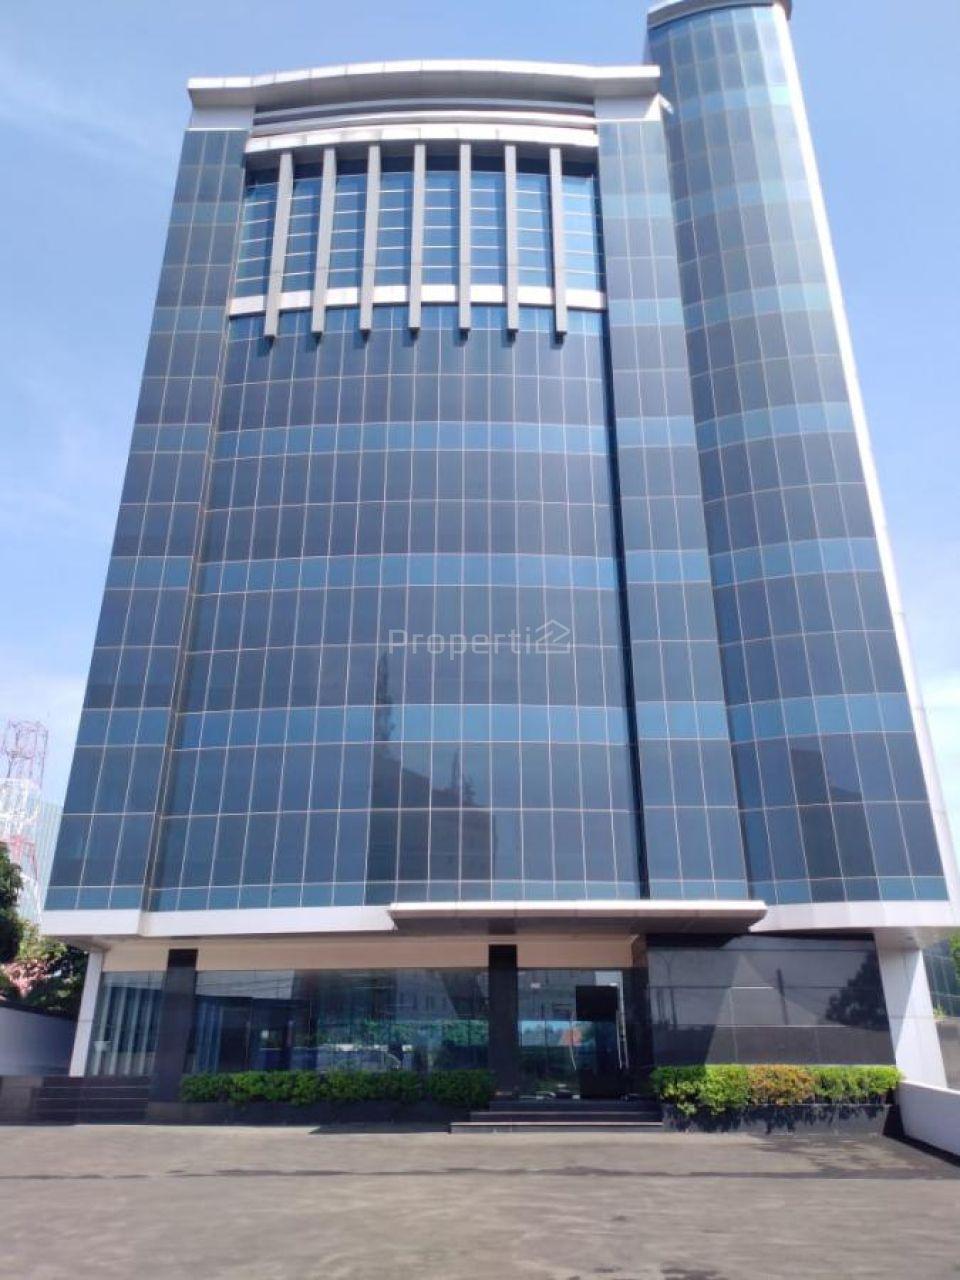 Gedung Kantor Baru di Kawasan Bisnis TB Simatupang, DKI Jakarta